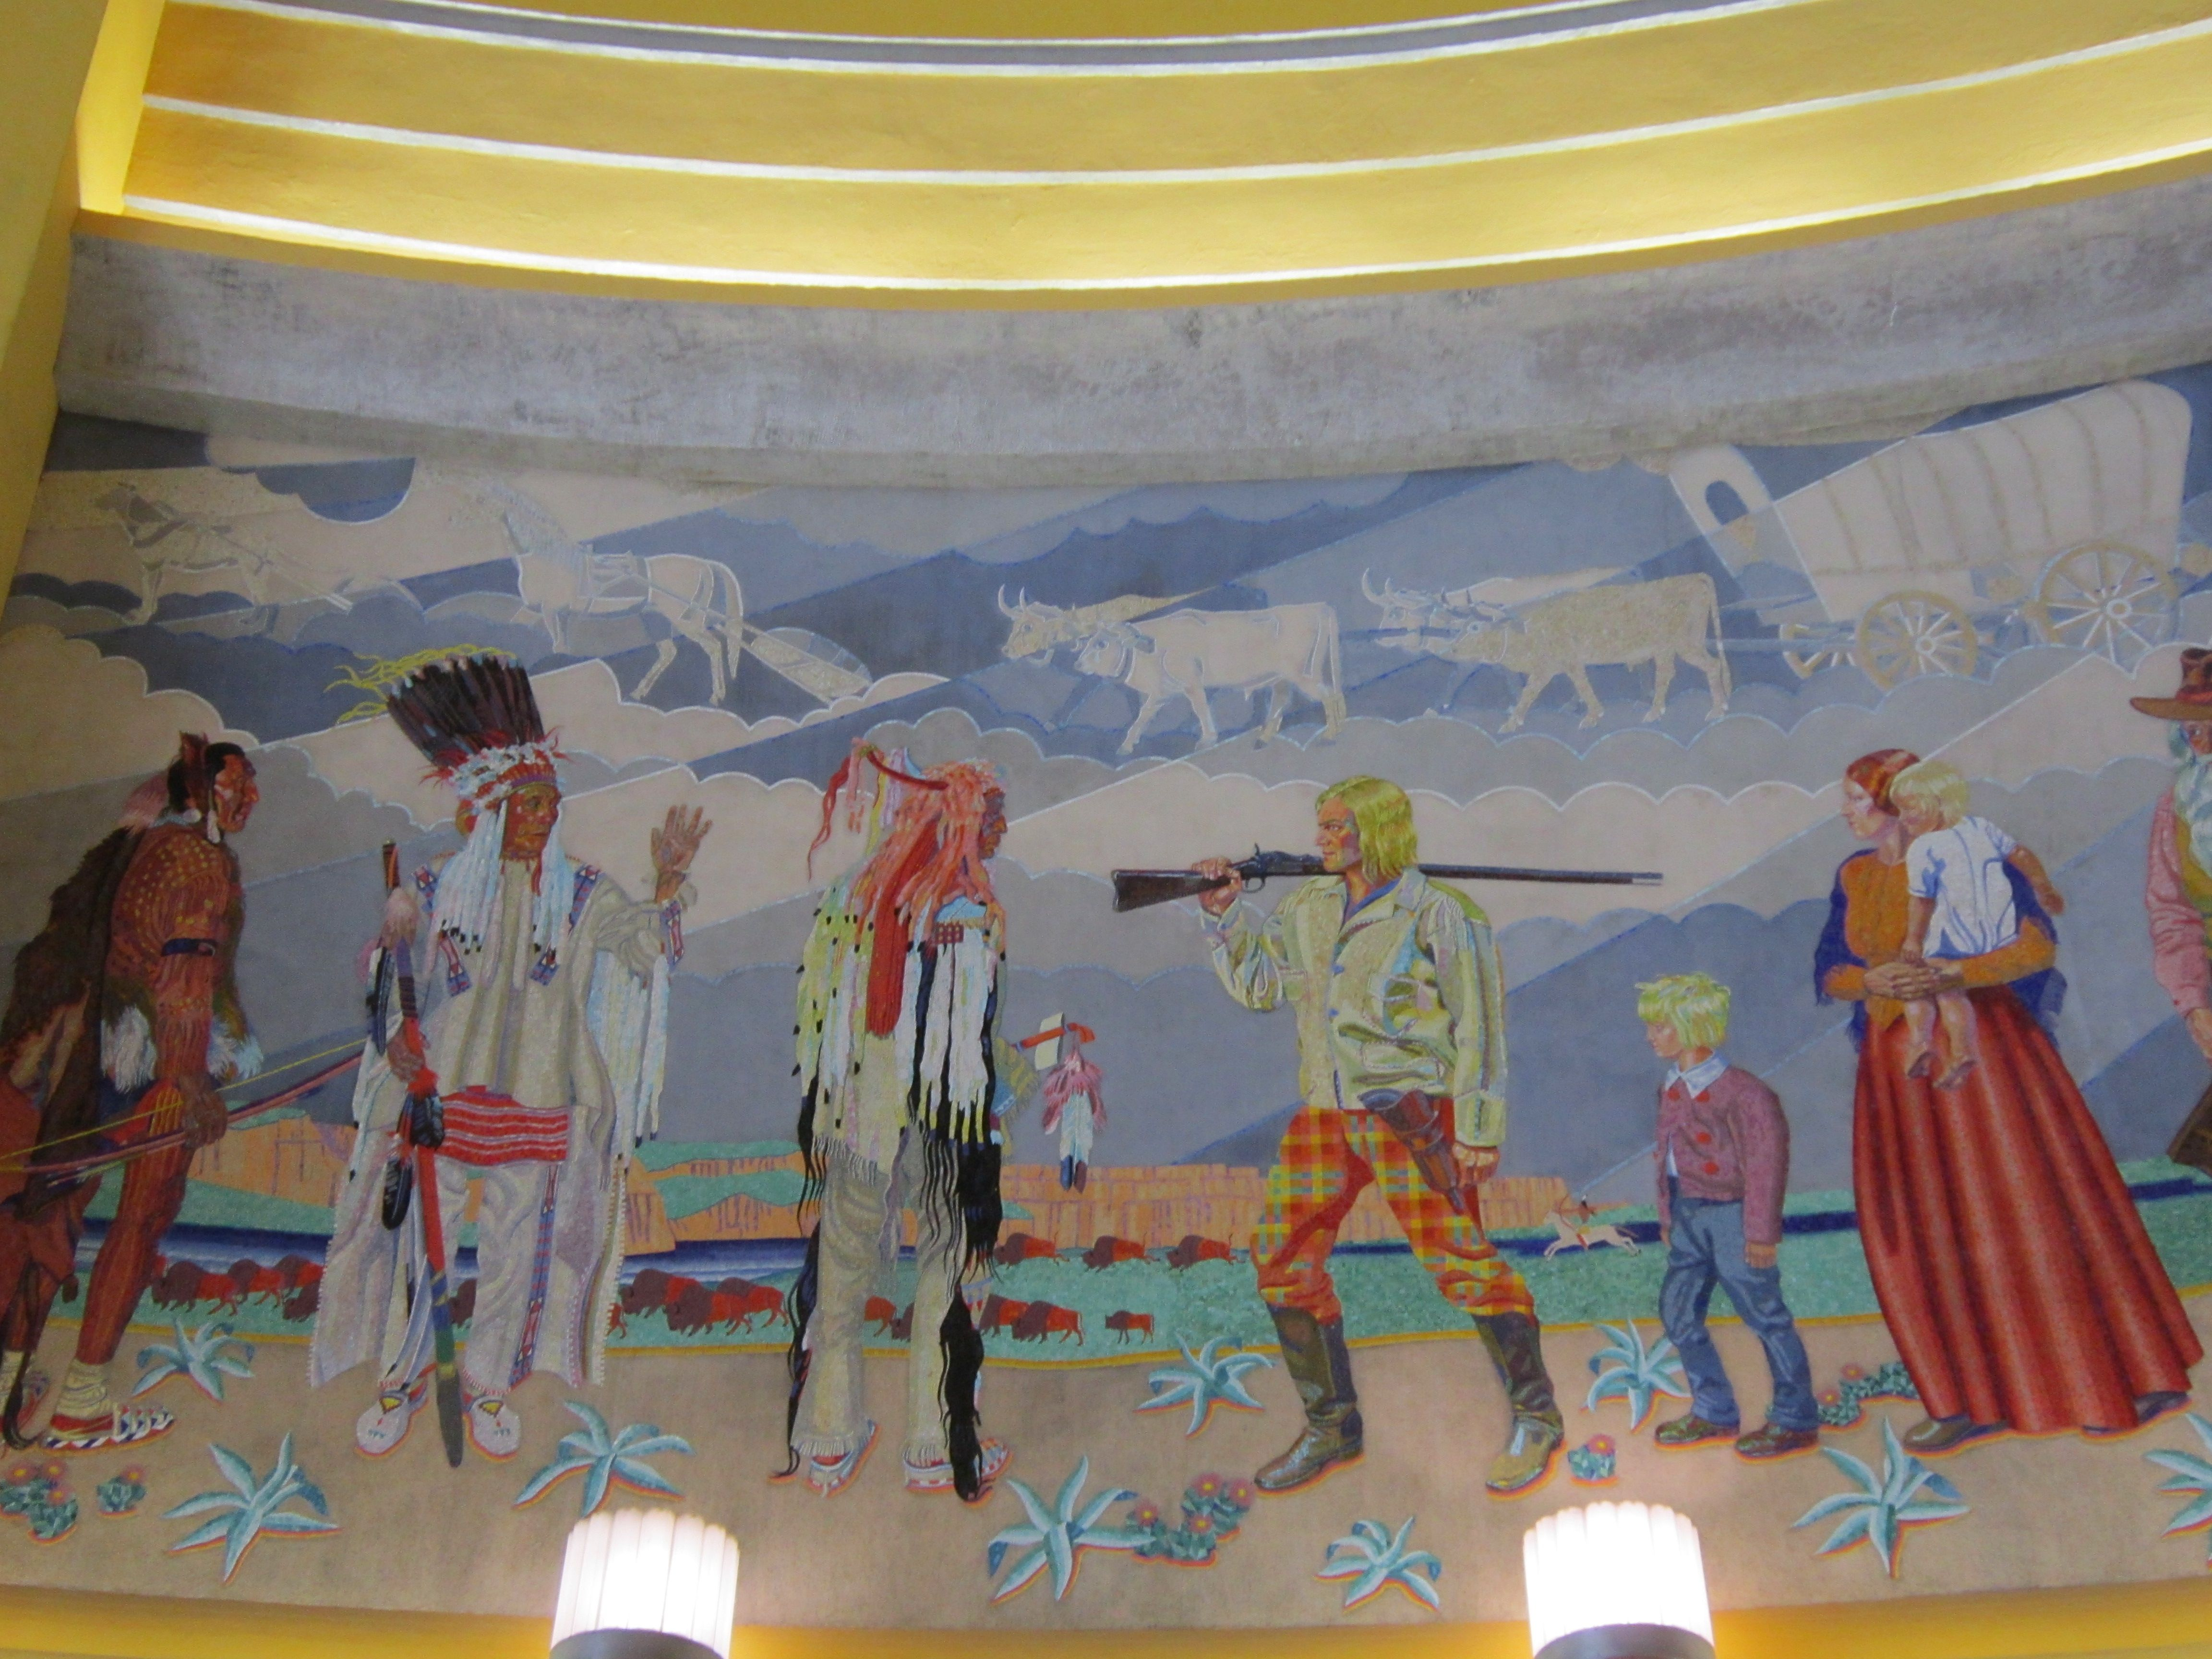 mosaic murals at the Cincinnati Museum Center - previous